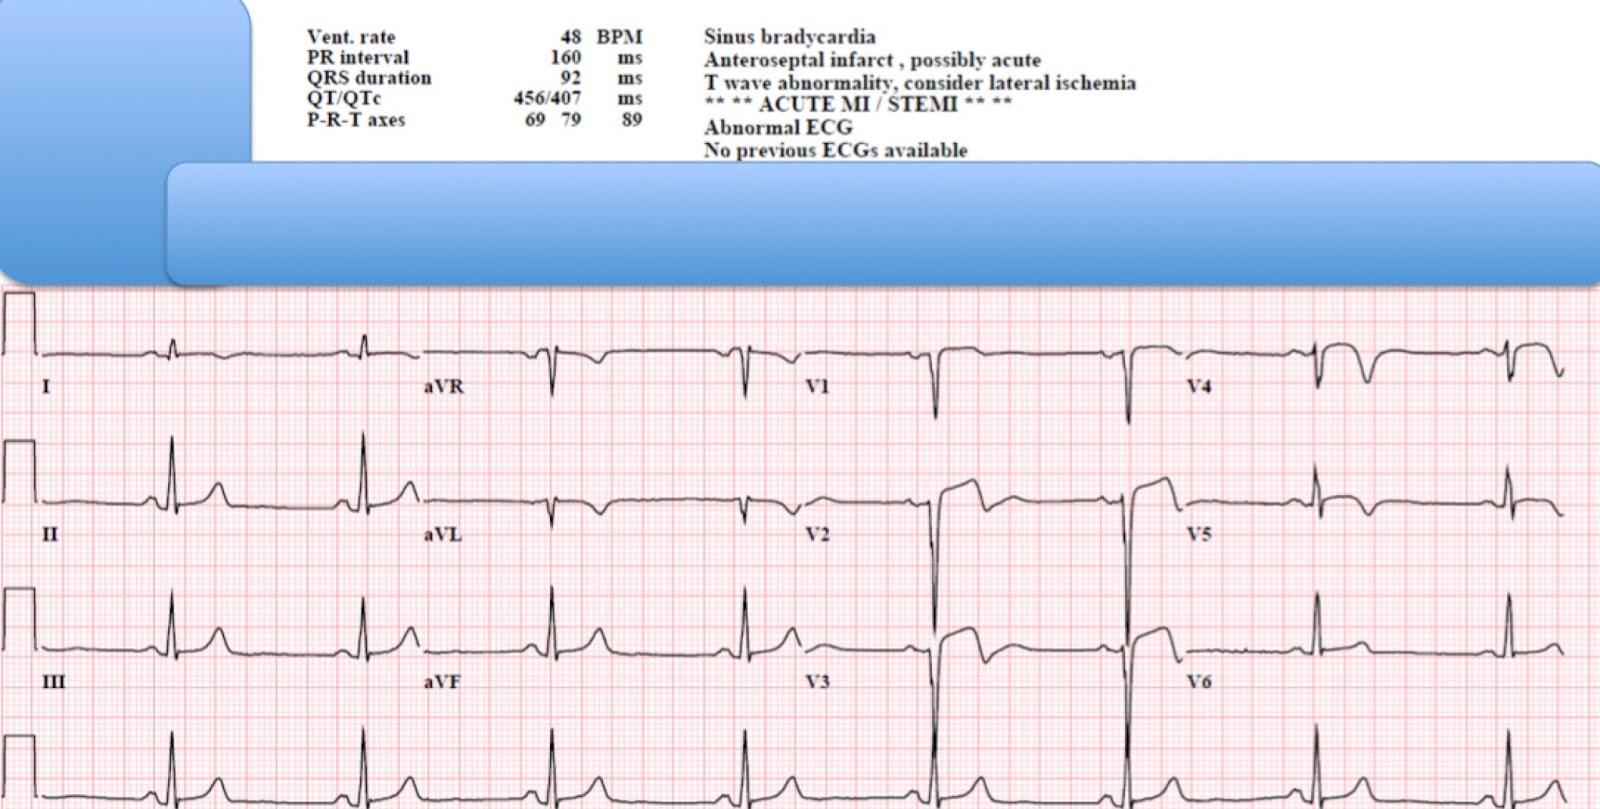 Triple vessel coronary artery disease presenting as a ...